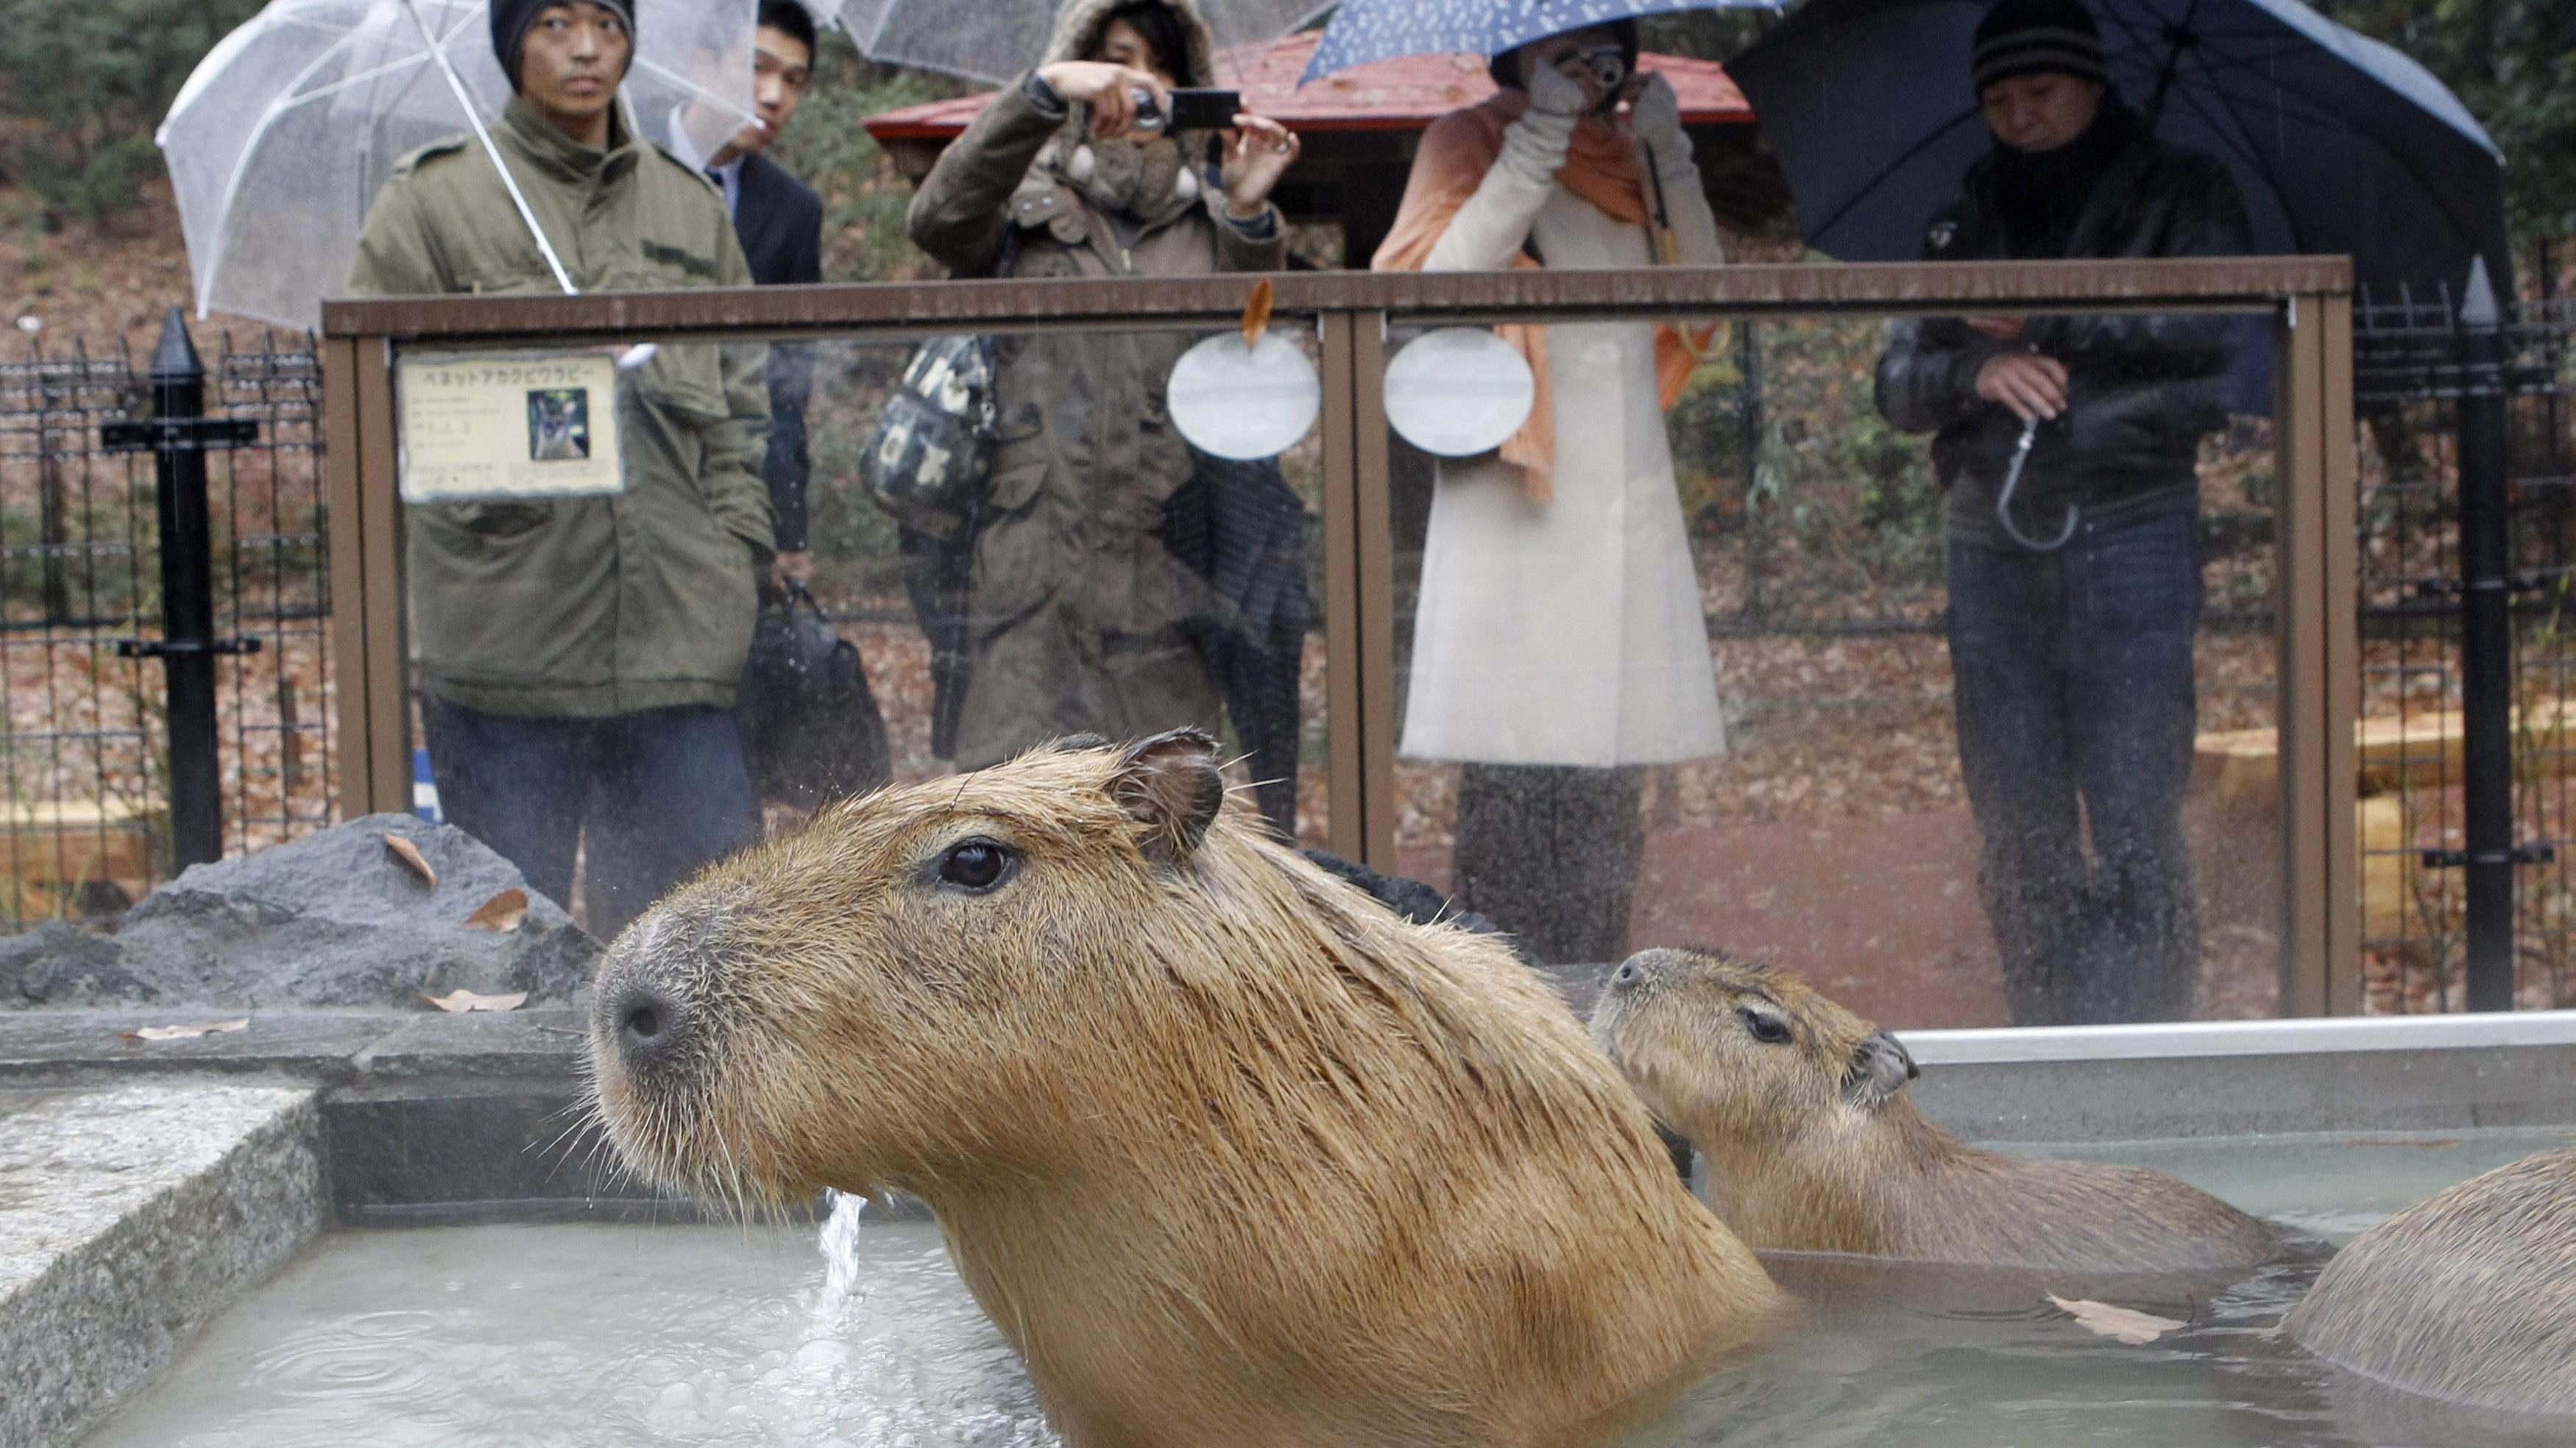 Capybaras sit inside a hot tub at the Saitama Children's Zoo in Higashimatsuyama, north of Tokyo December 11, 2009.